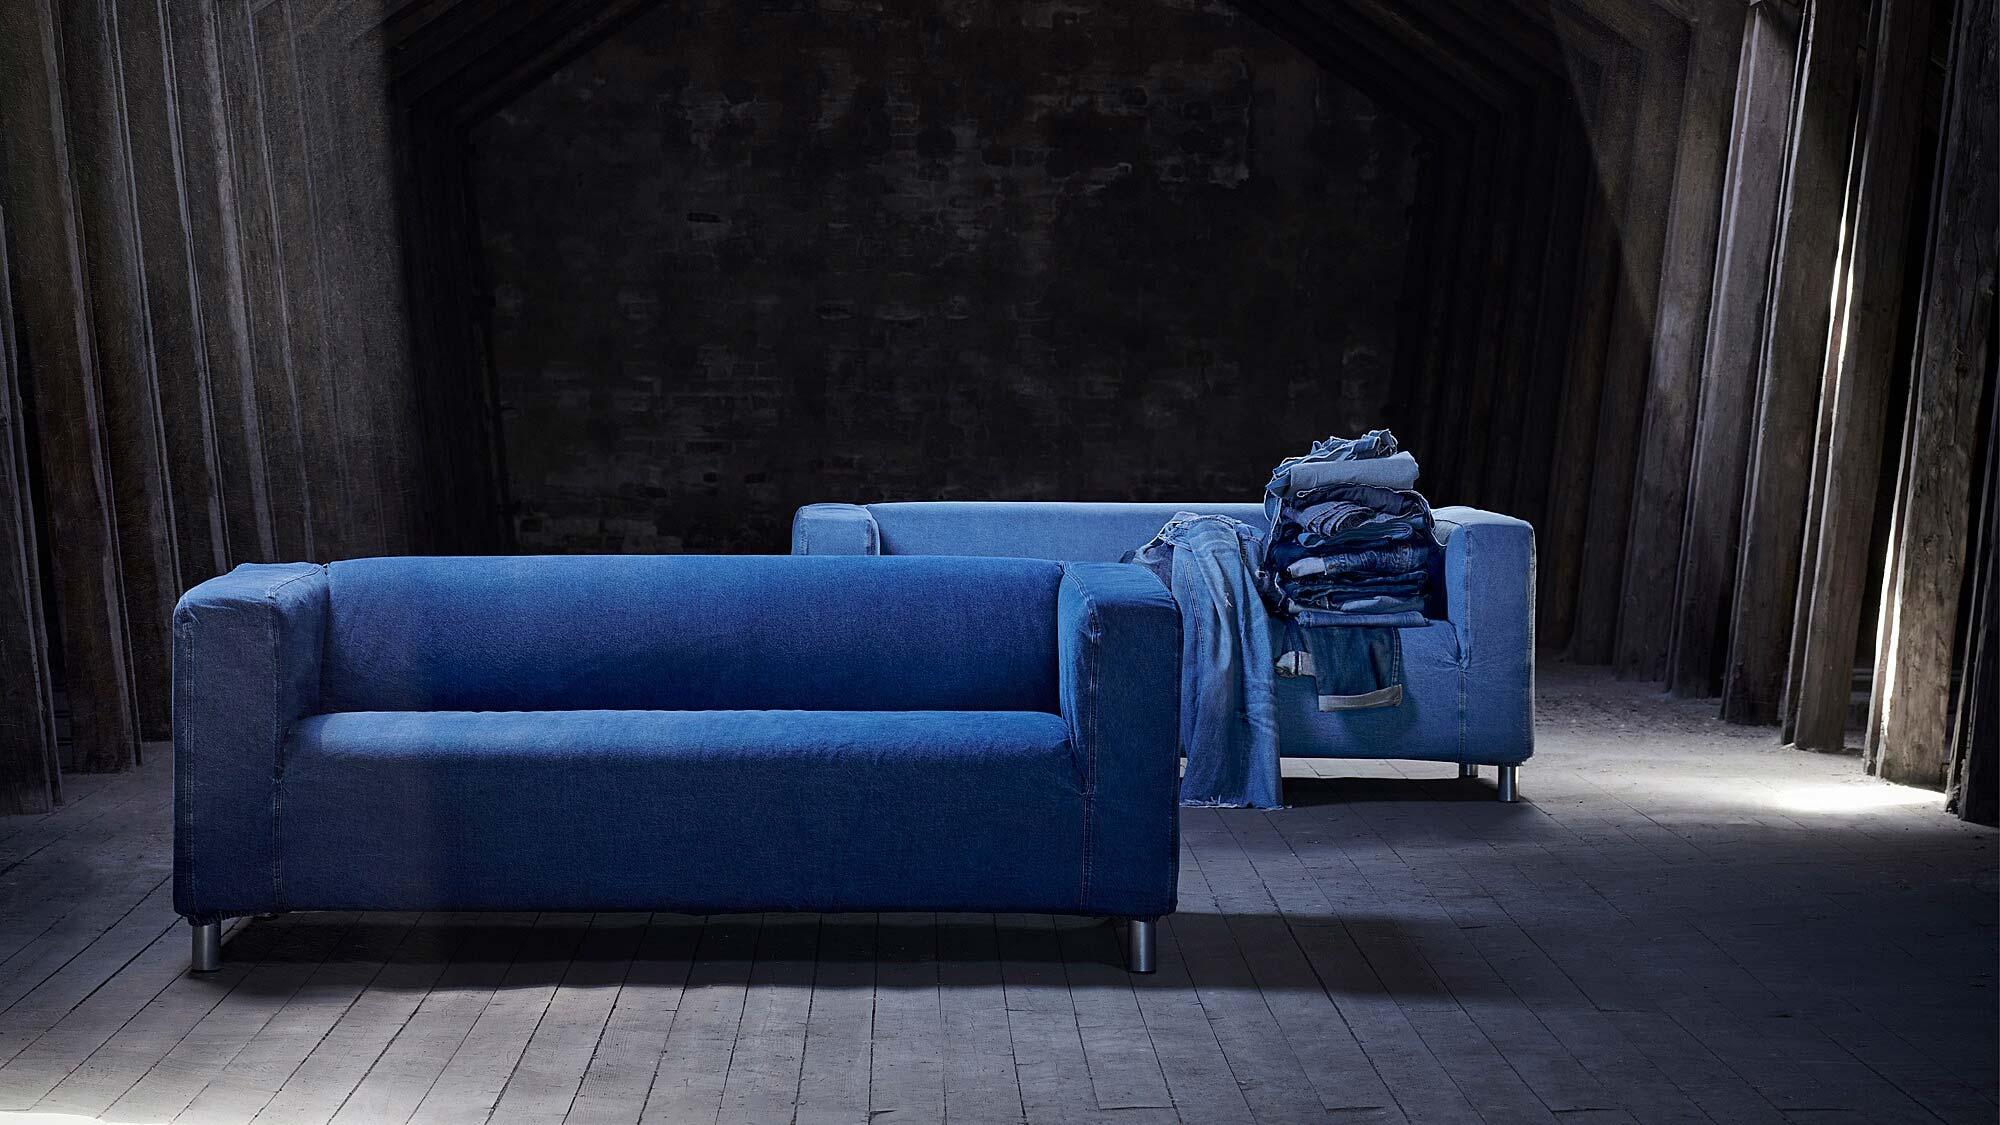 IKEA x MUD Jeans KLIPPAN Sofa Cover